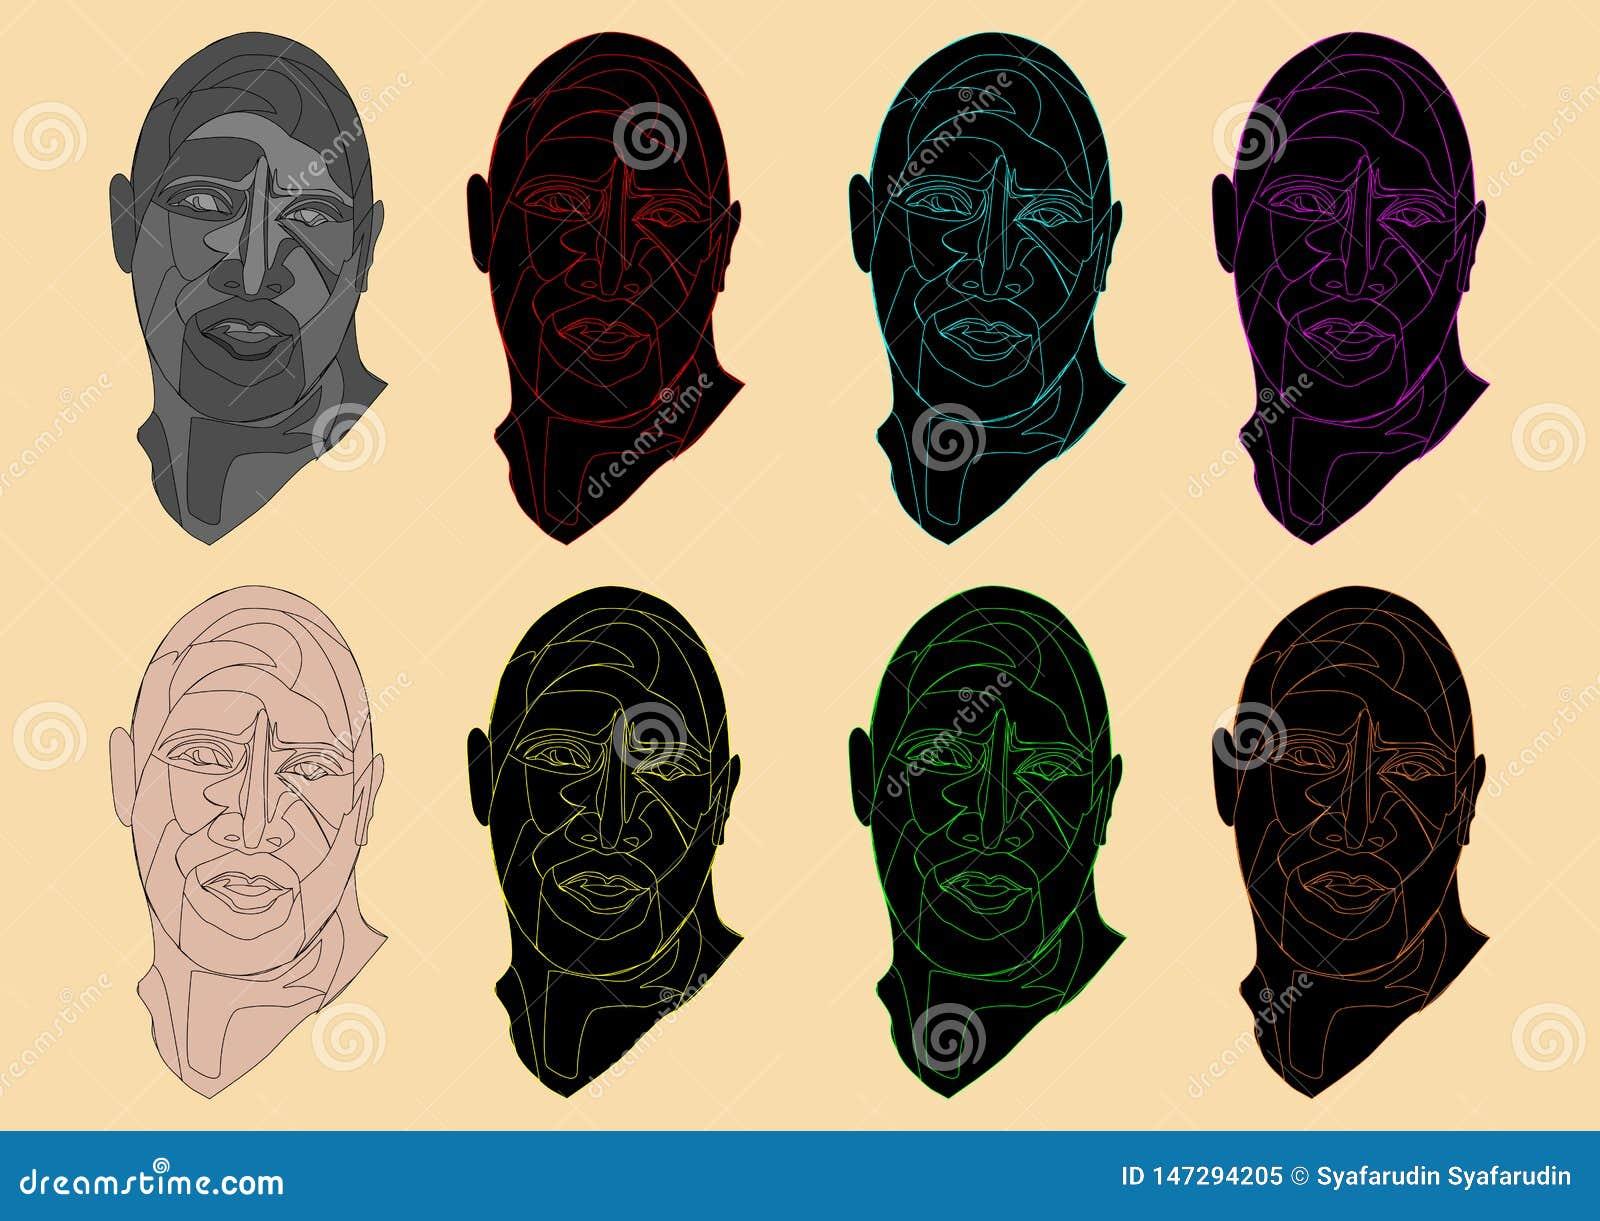 illustration of a unique colorful human head